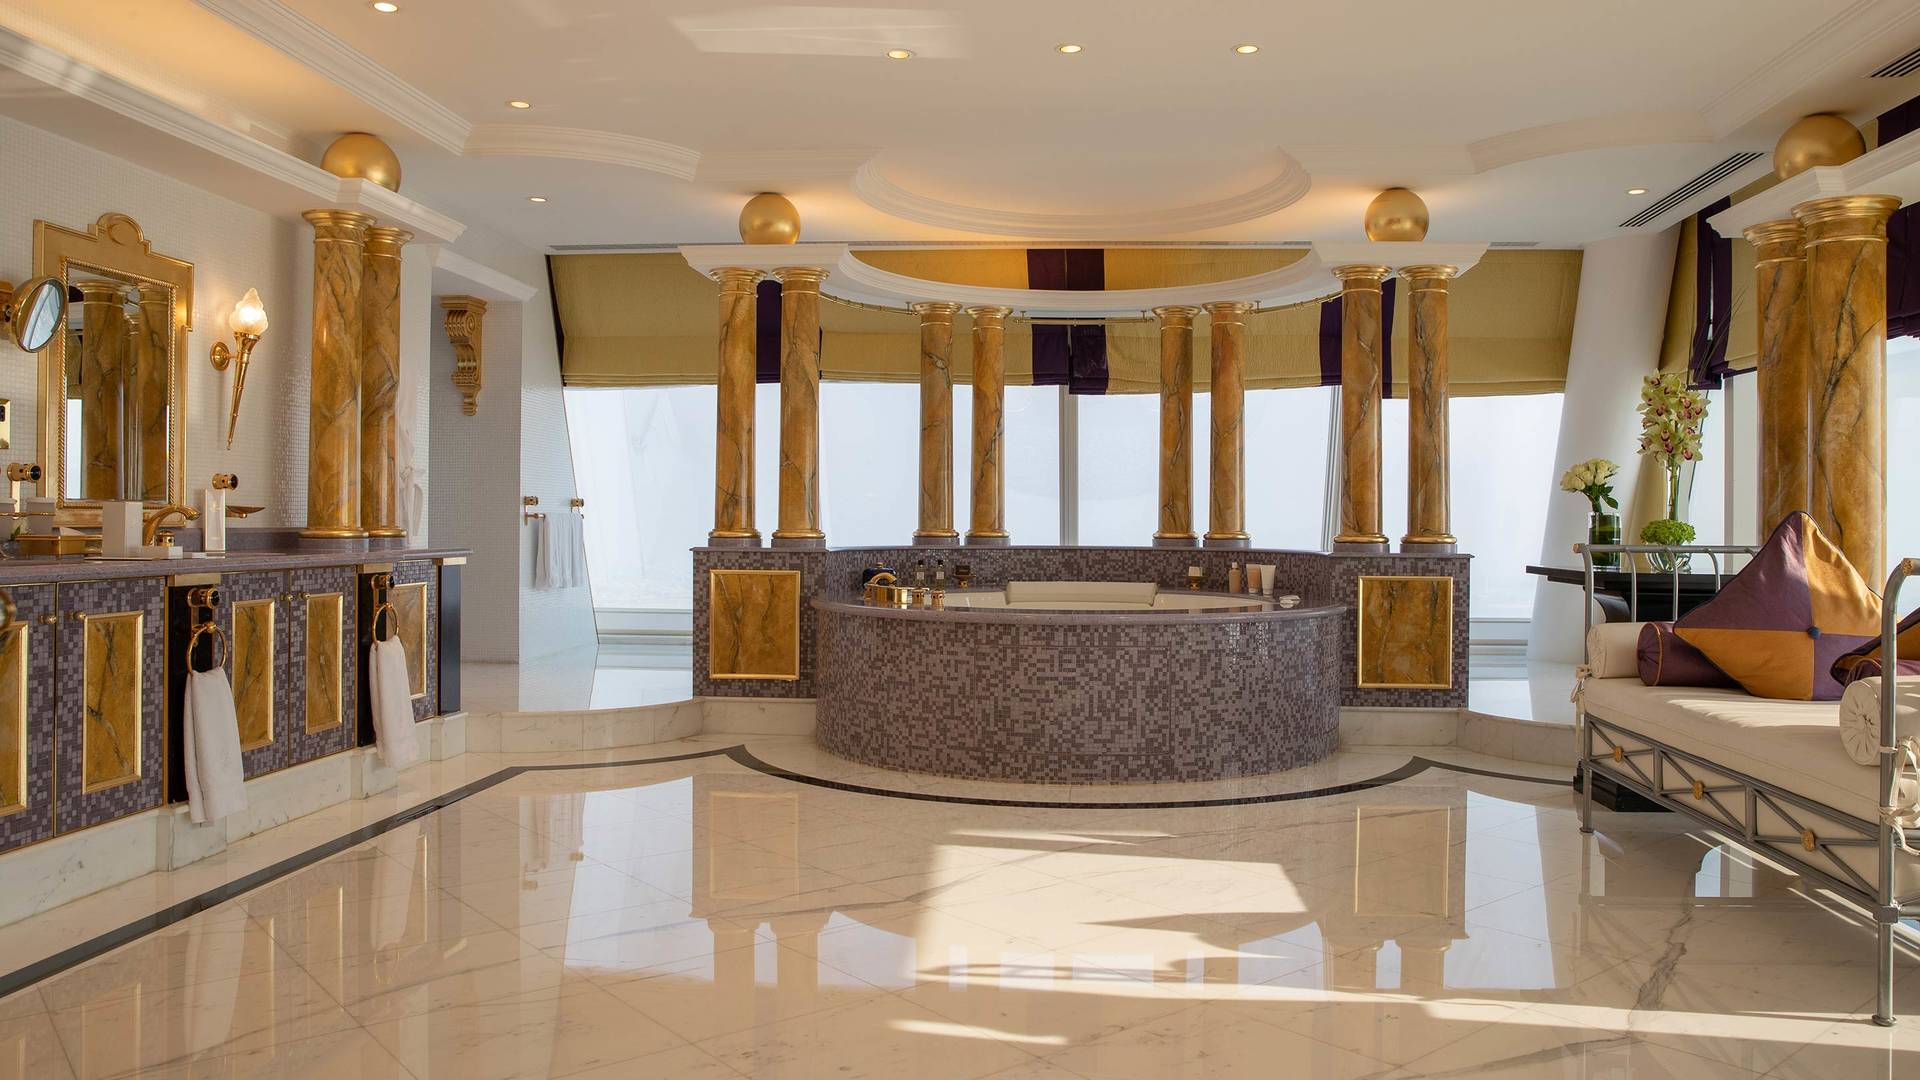 Jumeirah Burj Al Arab Presidential suite bathroom 2_16-9